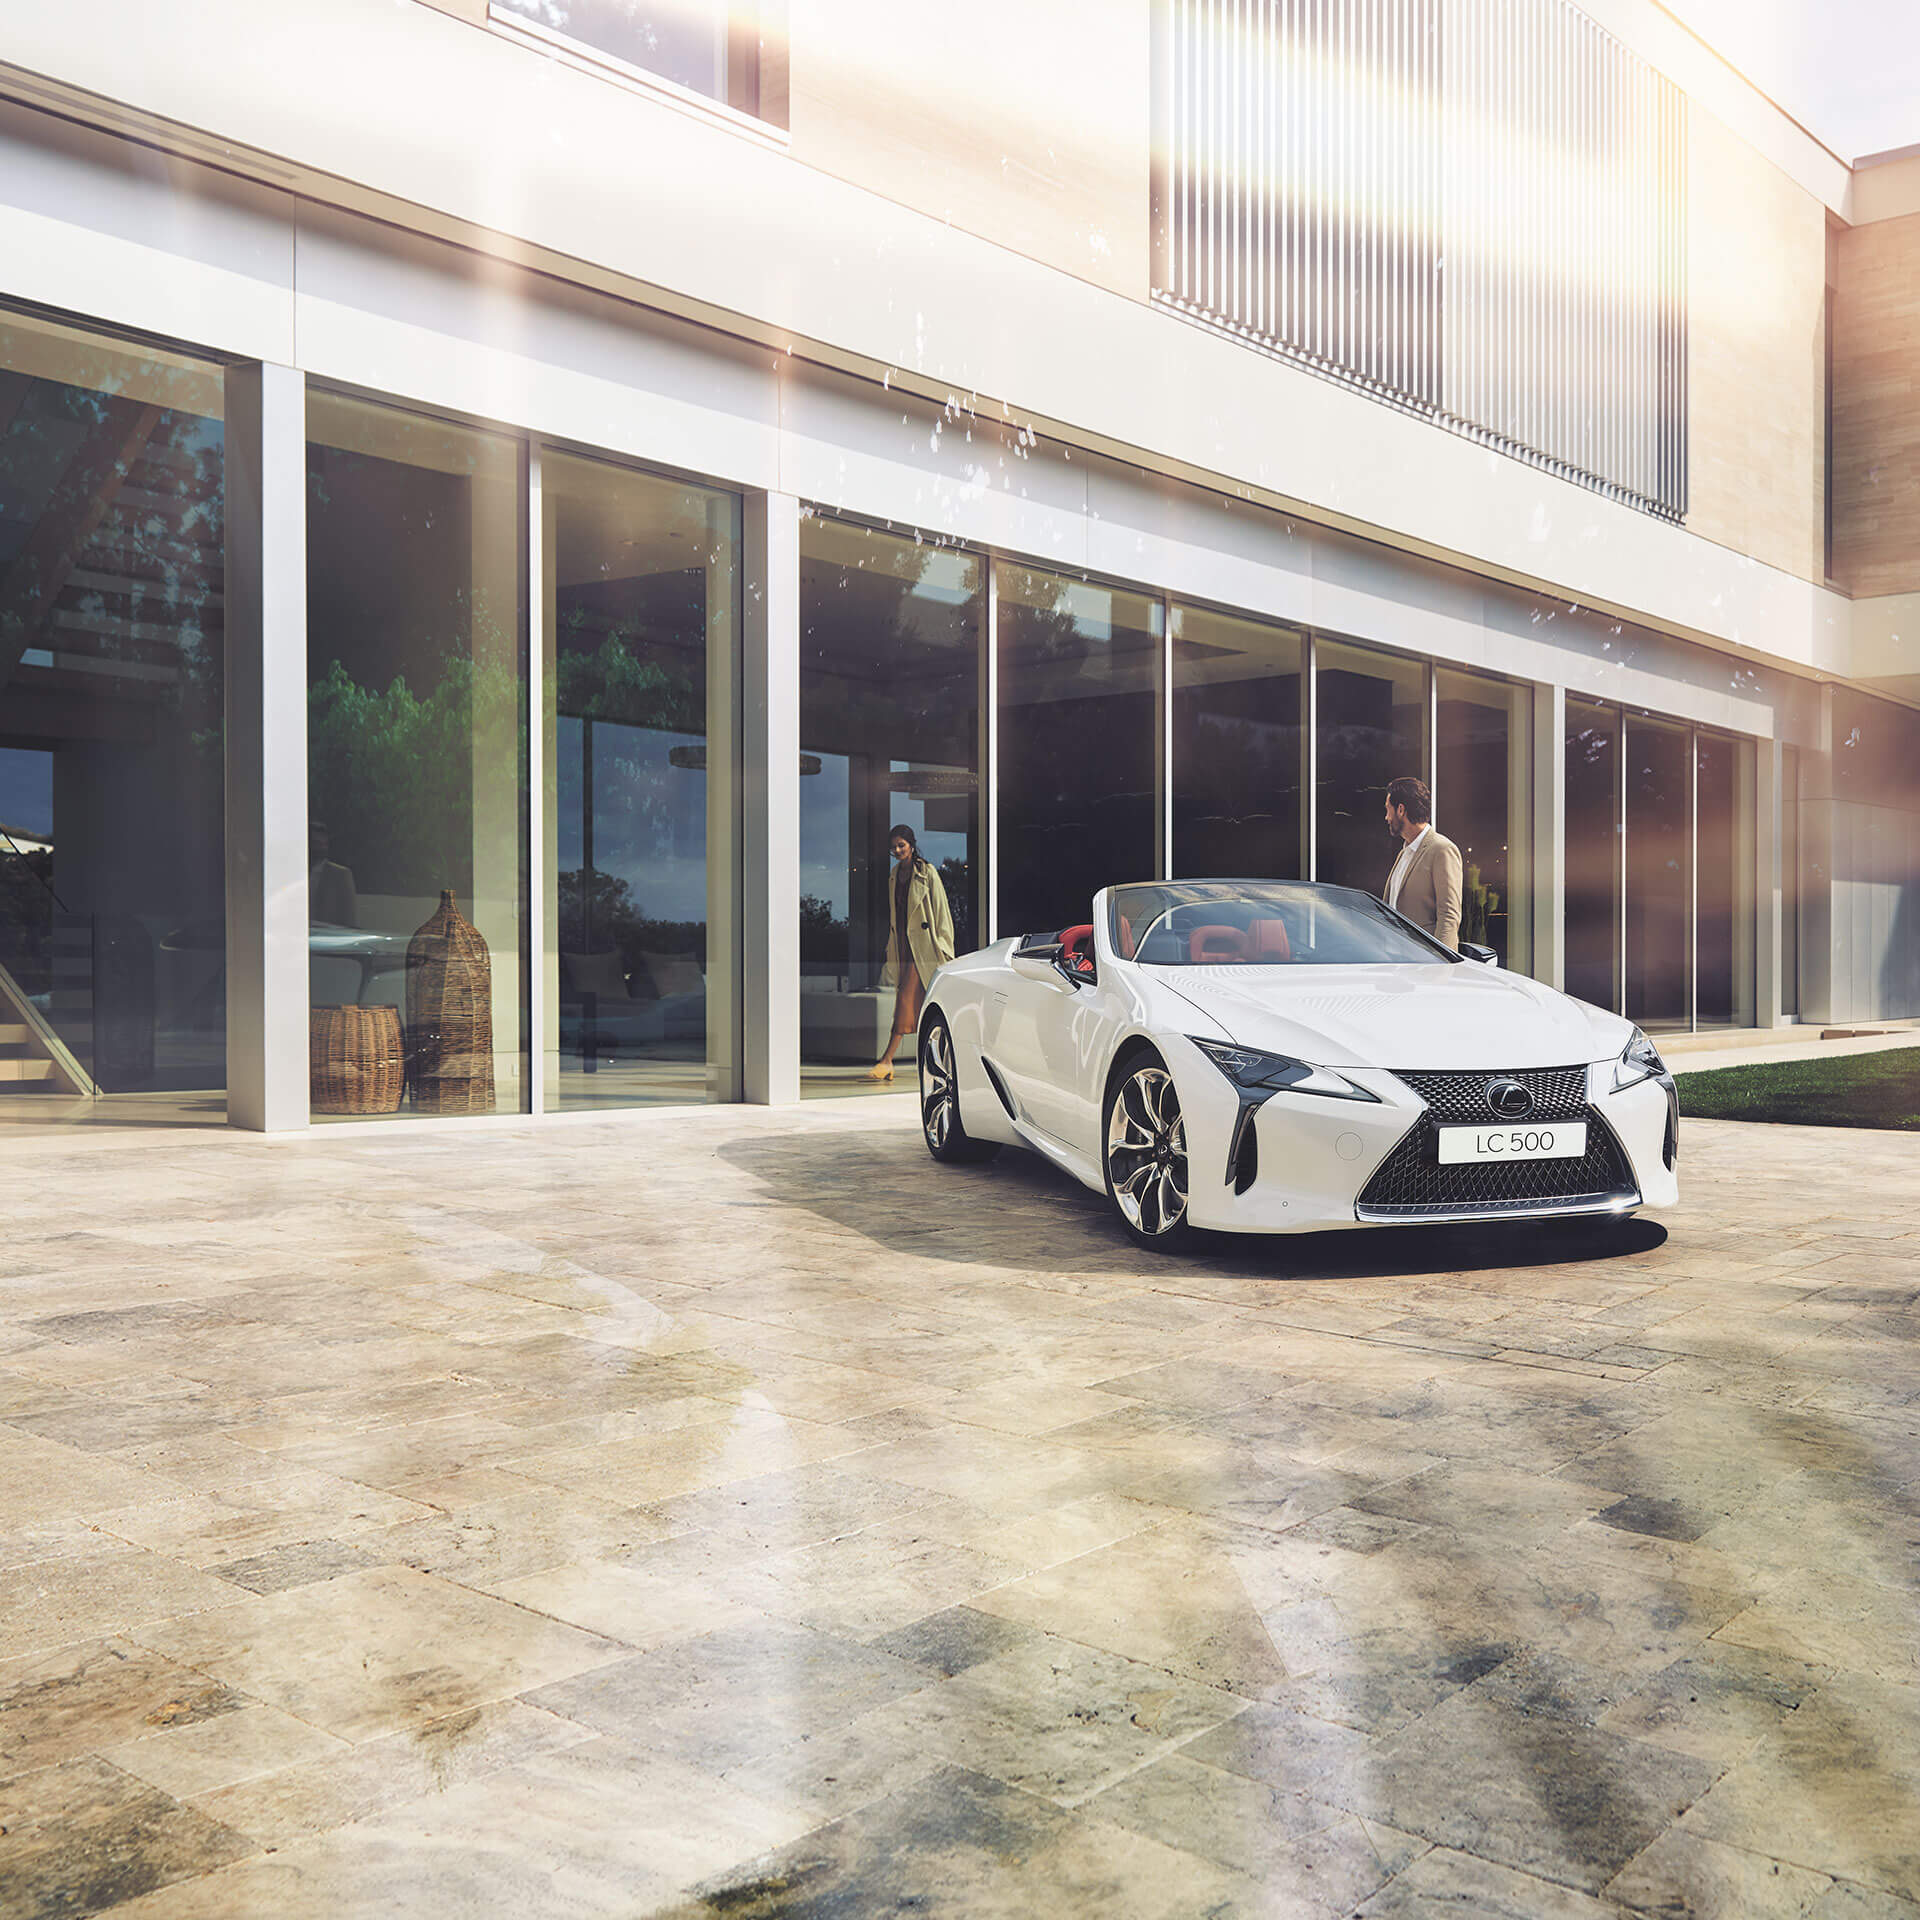 2020 lexus lc 500 convertible accessories